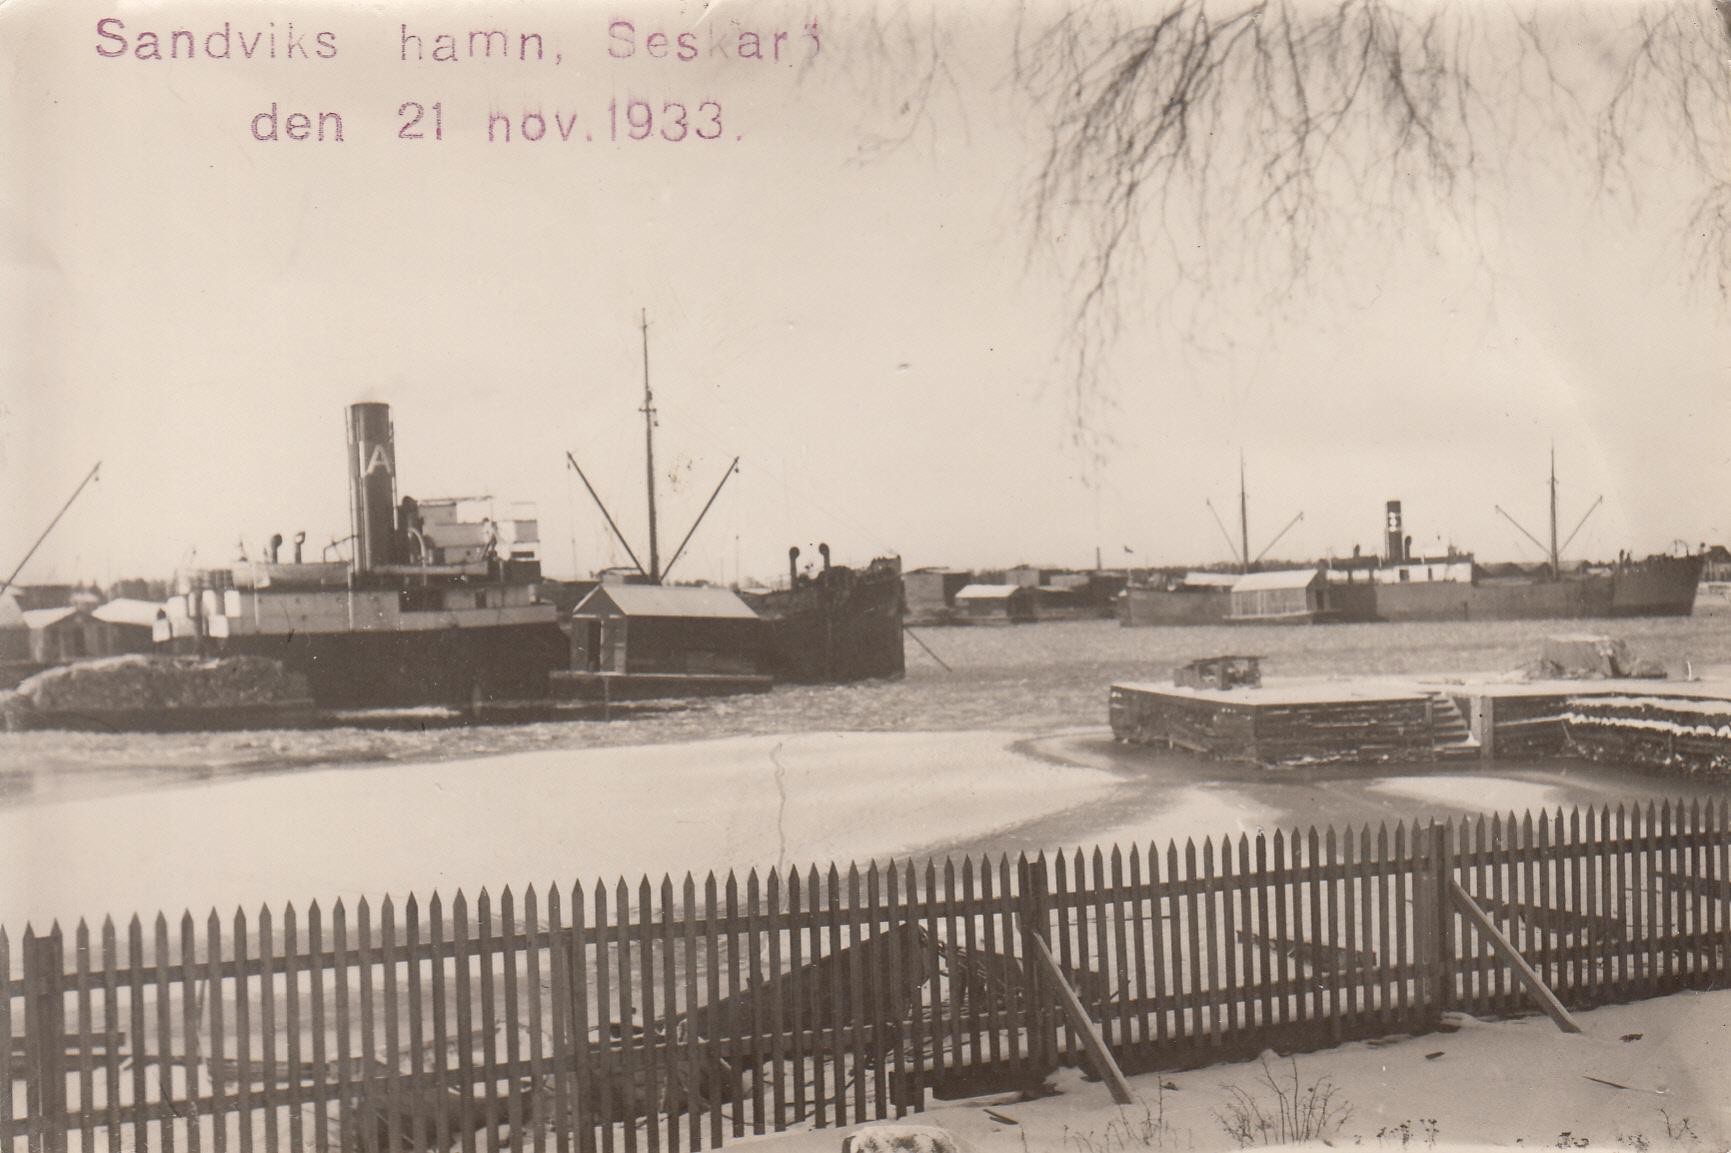 Sandviks hamn Seskarö 1933-11-21